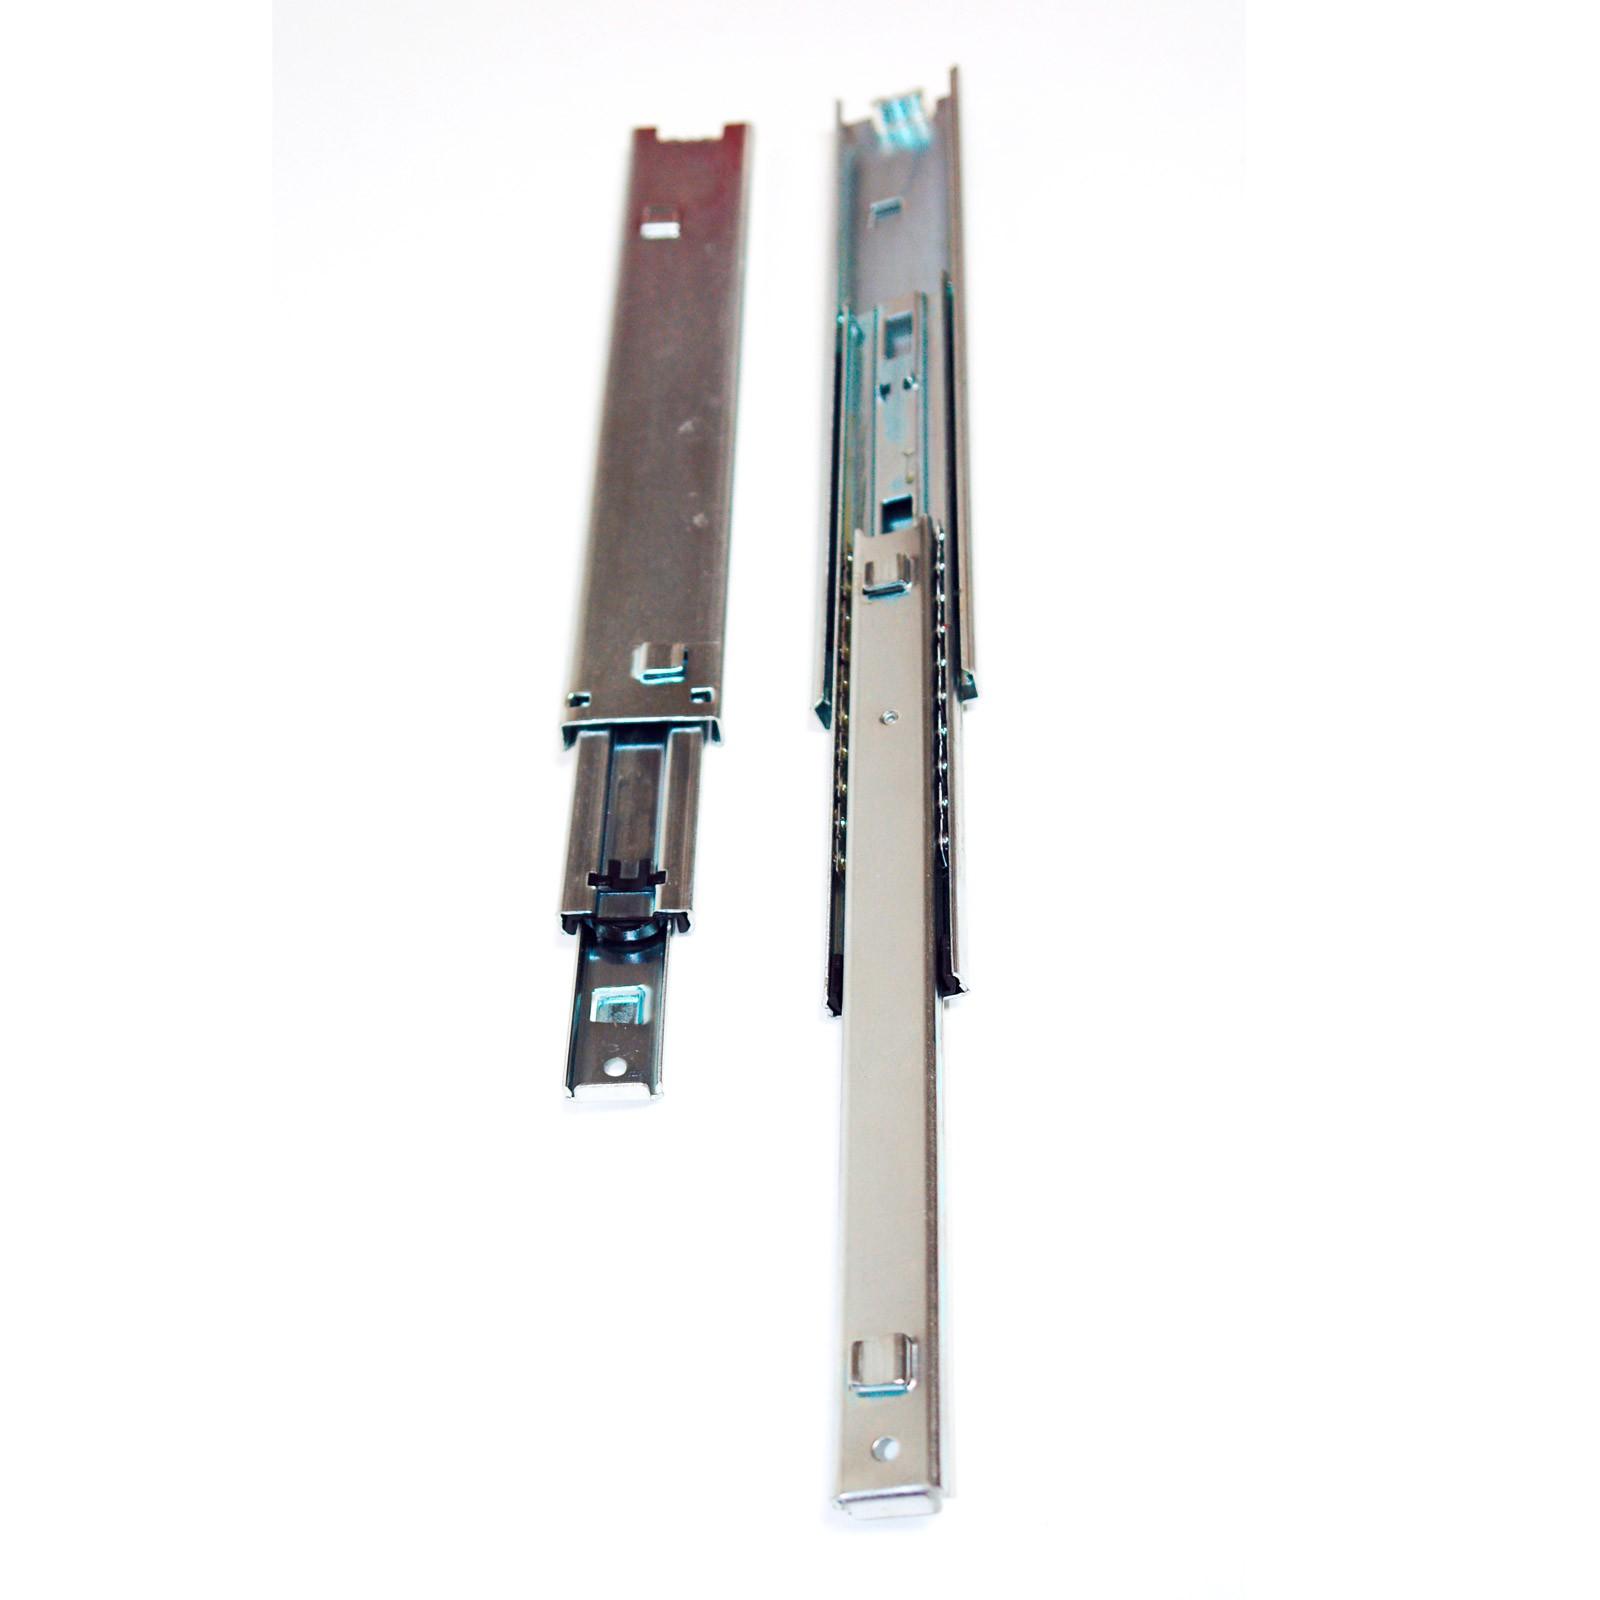 Teleskopschiene Fur Schubladen 3 Stufig 300mm 1 Paar Vollauszug